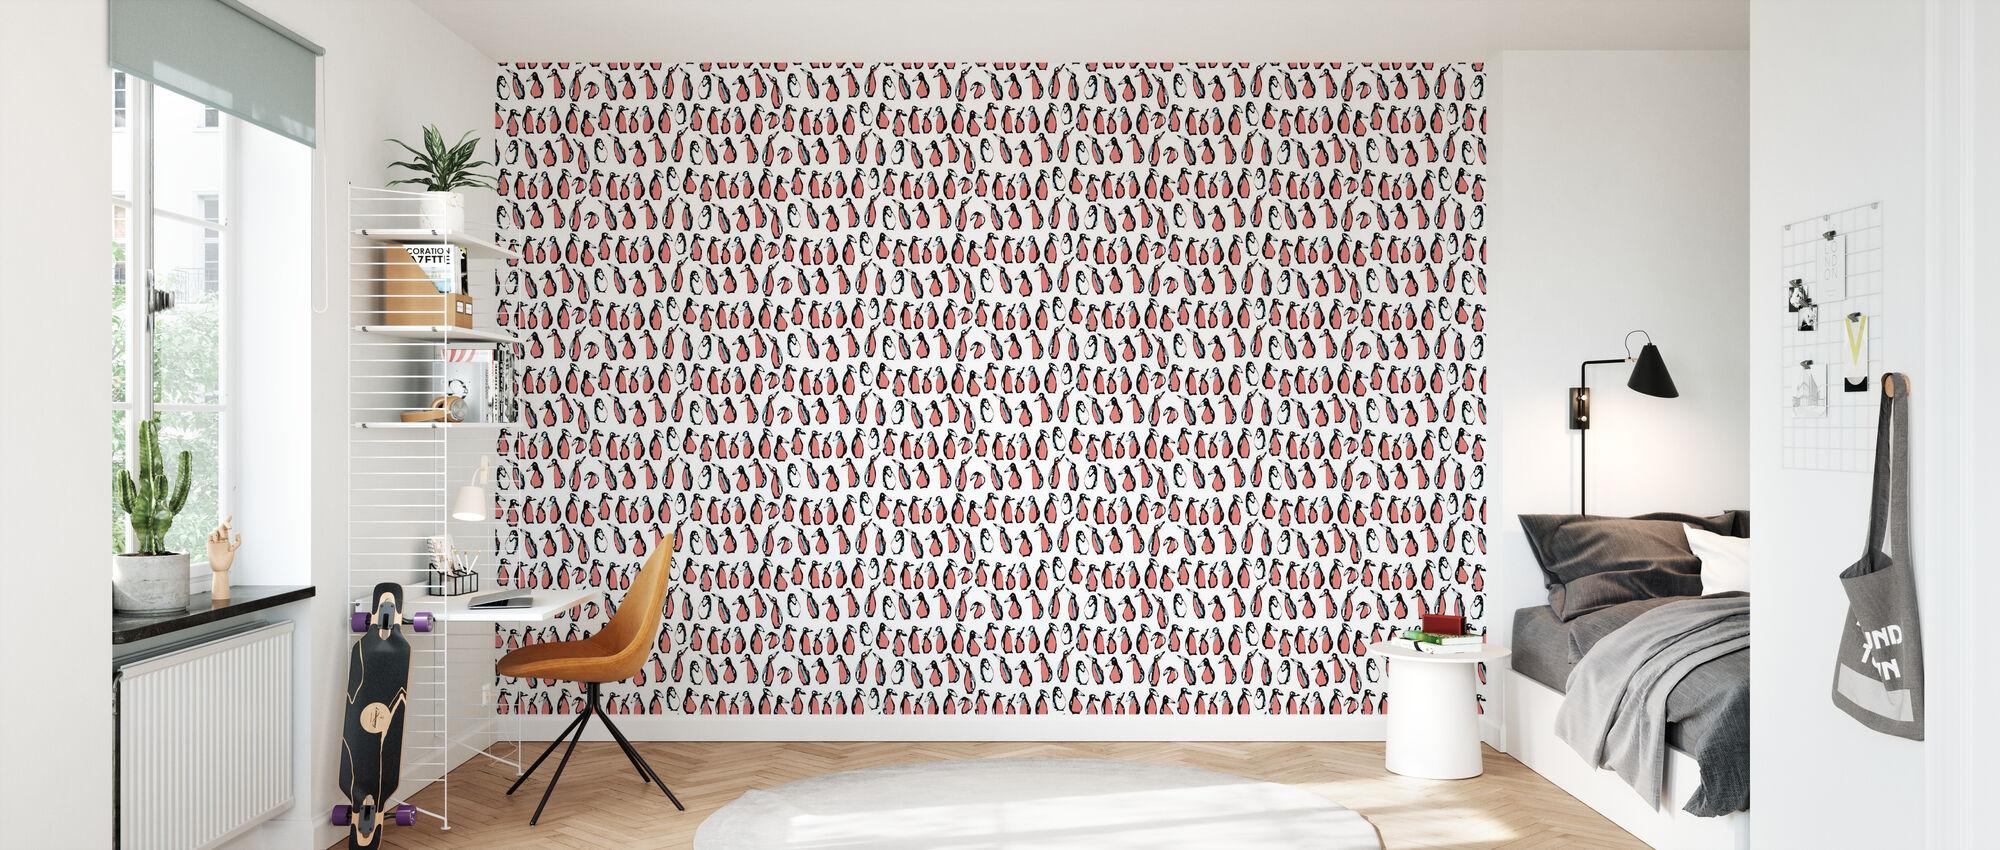 Pinguin Wilde Erdbeere - Tapete - Kinderzimmer